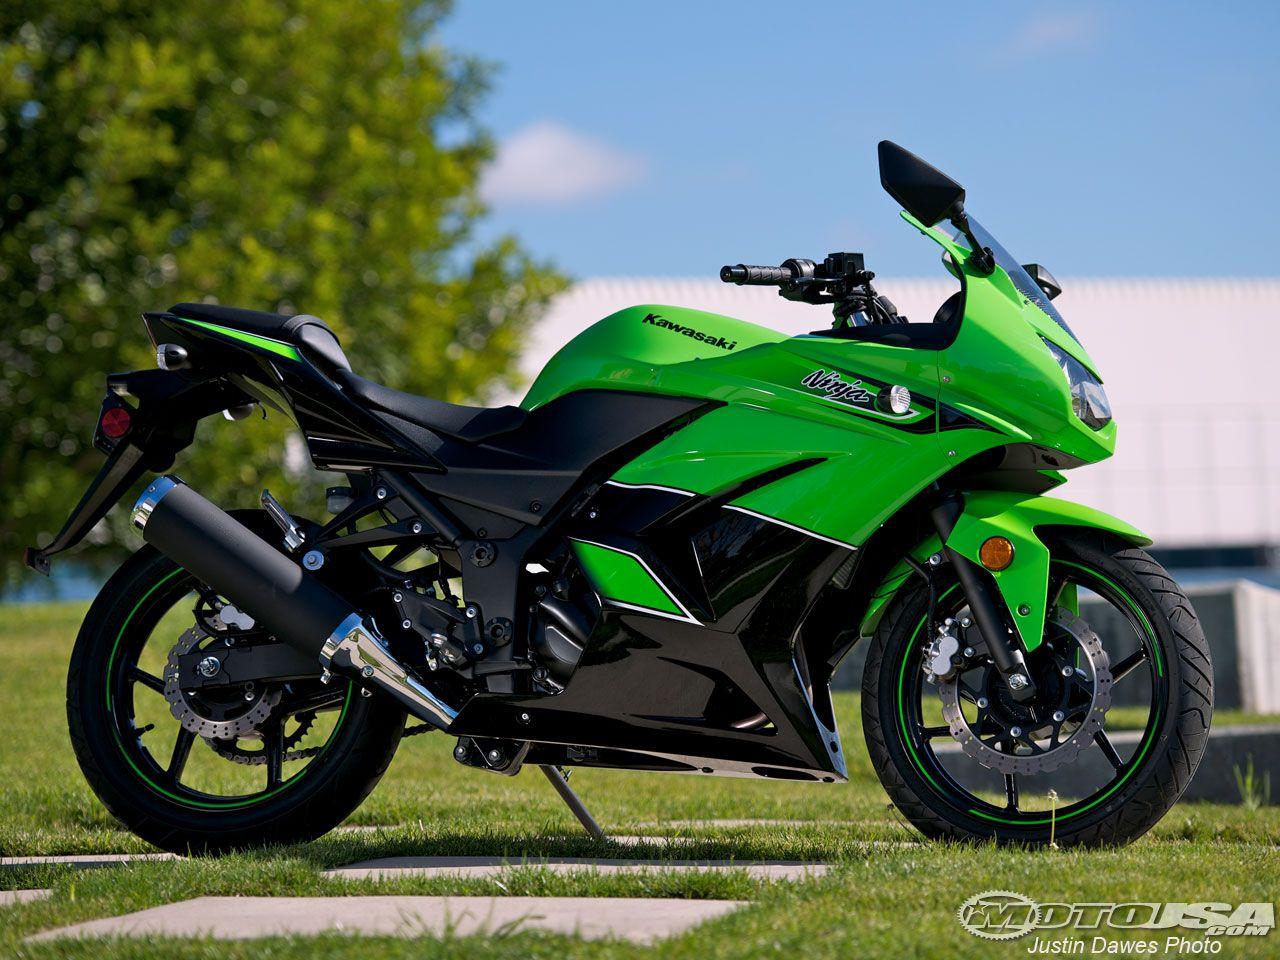 2011 Kawasaki Ninja 250R Comparison